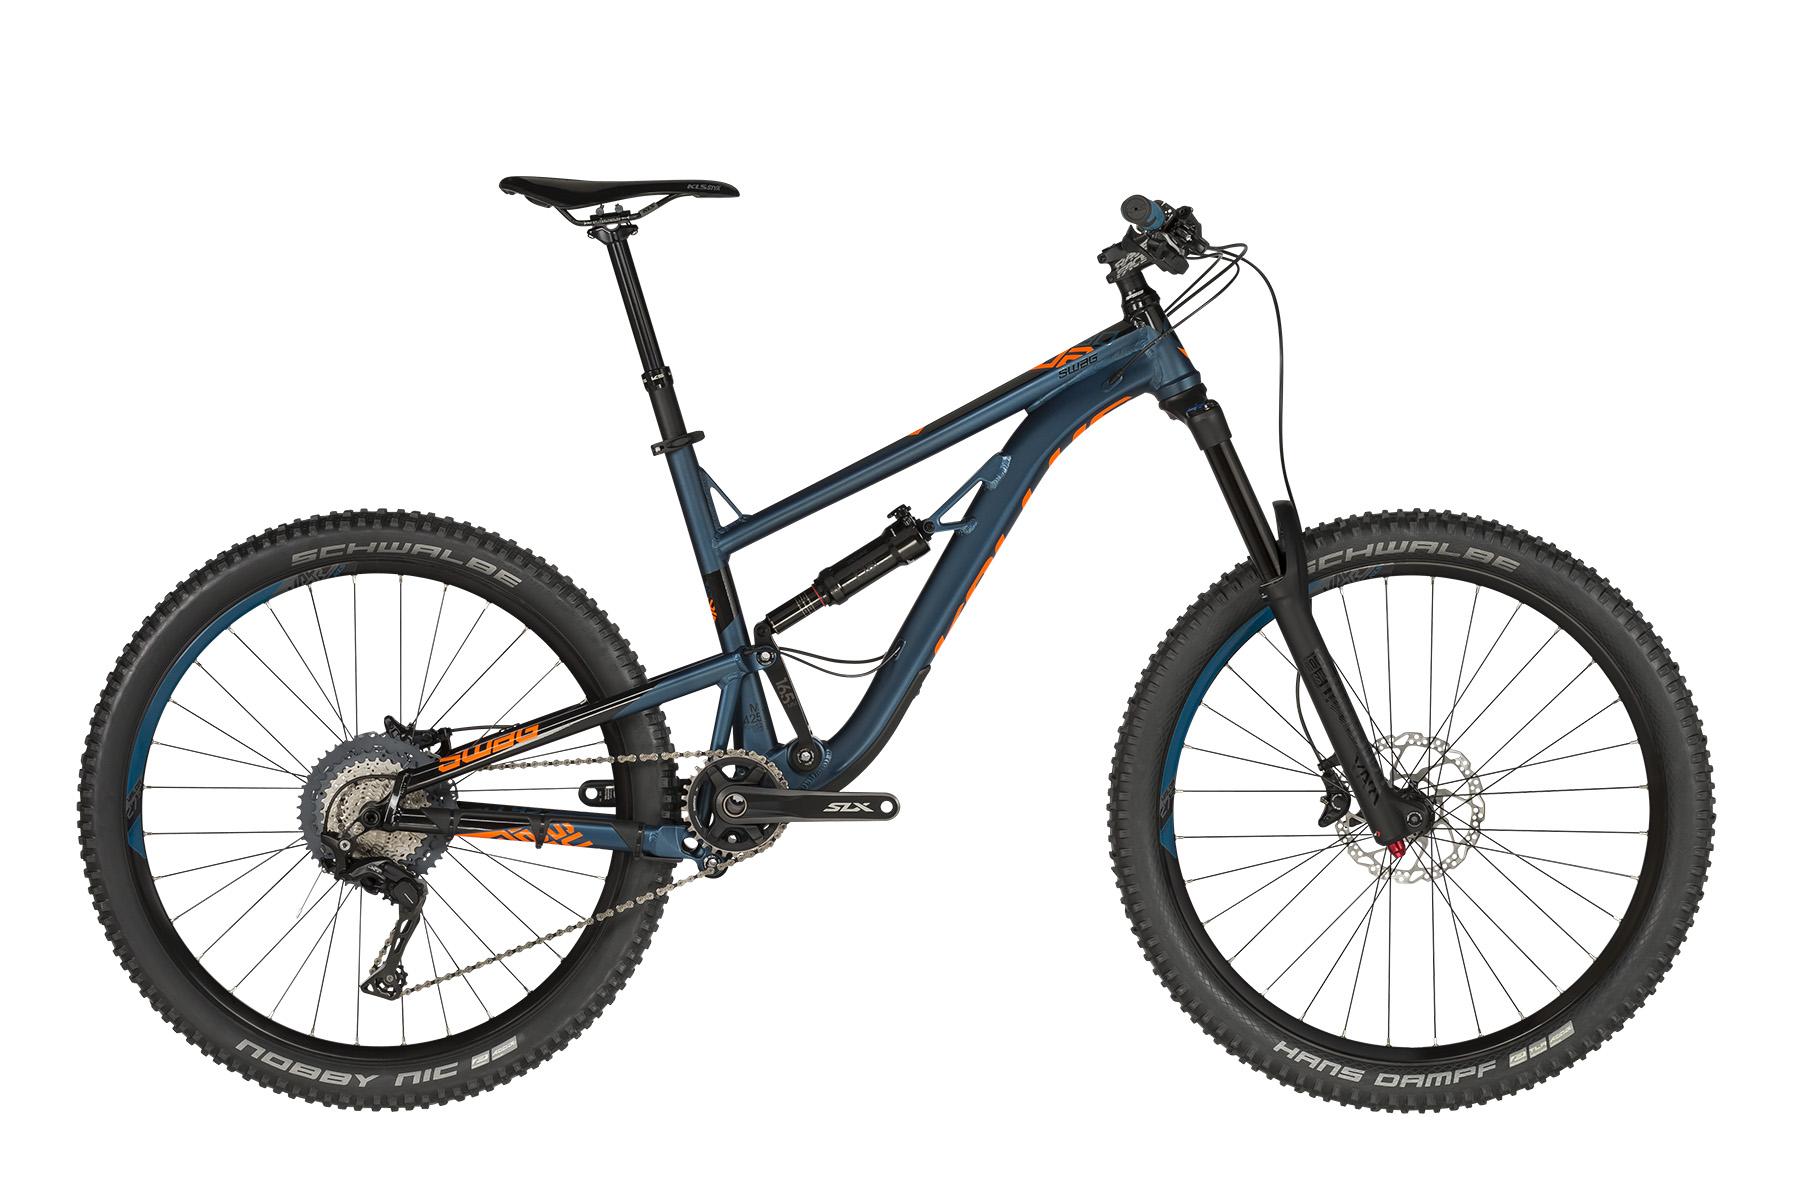 <strong>Bicicleta full suspension </strong>cu telescop fata&nbsp;ROCK SHOX Yari RC si telescop spate&nbsp;ROCK SHOX Deluxe RT.</p><p><strong>Bicicleta enduro cu echipare Shimano</strong> 11 viteze, schimbator de spate Deore XT.</p><p><strong>frame</strong>&nbsp;KELLYS Enduro 27.5 / Think Link suspension system, 165mm rear travel, tapered HT, internal routing, 12x148mm Boost thru axle<br /><strong>frame size</strong>&nbsp;S / M / L<br /><strong>fork</strong>&nbsp;ROCK SHOX Yari RC (27.5) Boost, 170mm, DebonAir / Motion Control RC / Maxle Stealth 15mm thru axle<br /><strong>rear shock</strong>&nbsp;ROCK SHOX Deluxe RT, DebonAir / Rapid Recovery / Open-Pedal (230x65mm)<br /><strong>head parts</strong>&nbsp;FSA 1.5 integrated<br /><strong>b.b.parts</strong>&nbsp;SHIMANO PressFit SM-BB71-41A<br /><strong>crankset</strong>&nbsp;SHIMANO SLX M7000-11-B1 Hollowtech II (30) - length 175mm<br /><strong>shifters</strong>&nbsp;SHIMANO SLX SL-M7000 I-spec II Rapidfire Plus<br /><strong>r/derailleur</strong>&nbsp;SHIMANO Deore XT M8000 (direct mount)<br /><strong>speed</strong>&nbsp;11<br /><strong>cassette sprocket</strong>&nbsp;SHIMANO CS-M7000-11 (11-46)<br /><strong>chain</strong>&nbsp;KMC X11 (110 links)<br /><strong>brakes</strong>&nbsp;SHIMANO SLX M7000 Hydraulic Disc<br /><strong>brake rotors</strong>&nbsp;180mm front / 180mm rear<br /><strong>brake levers</strong>&nbsp;SHIMANO SLX BL-M7000<br /><strong>hubs</strong>&nbsp;SHIMANO MT400-B Disc Center Lock (15x110mm / 12x148mm / 32 holes)<br /><strong>thru axle</strong>&nbsp;ROCK SHOX Maxle Stealth 15x110mm front / Mr.Control 12x148mm rear<br /><strong>rims</strong>&nbsp;KLS Valor 2 Disc 584x27 (32 holes)<br /><strong>spokes</strong>&nbsp;stainless steel black<br /><strong>tires</strong>&nbsp;SCHWALBE Hans Dampf Performance 60-584 (27.5x2.35) Tubeless Ready, ADDIX, folding front / SCHWALBE Nobby Nic Performance 60-584 (27.5x2.35) ADDIX, folding rear<br /><strong>stem</strong>&nbsp;RACE FACE Chester 35 - diam 28.6mm / bar bor